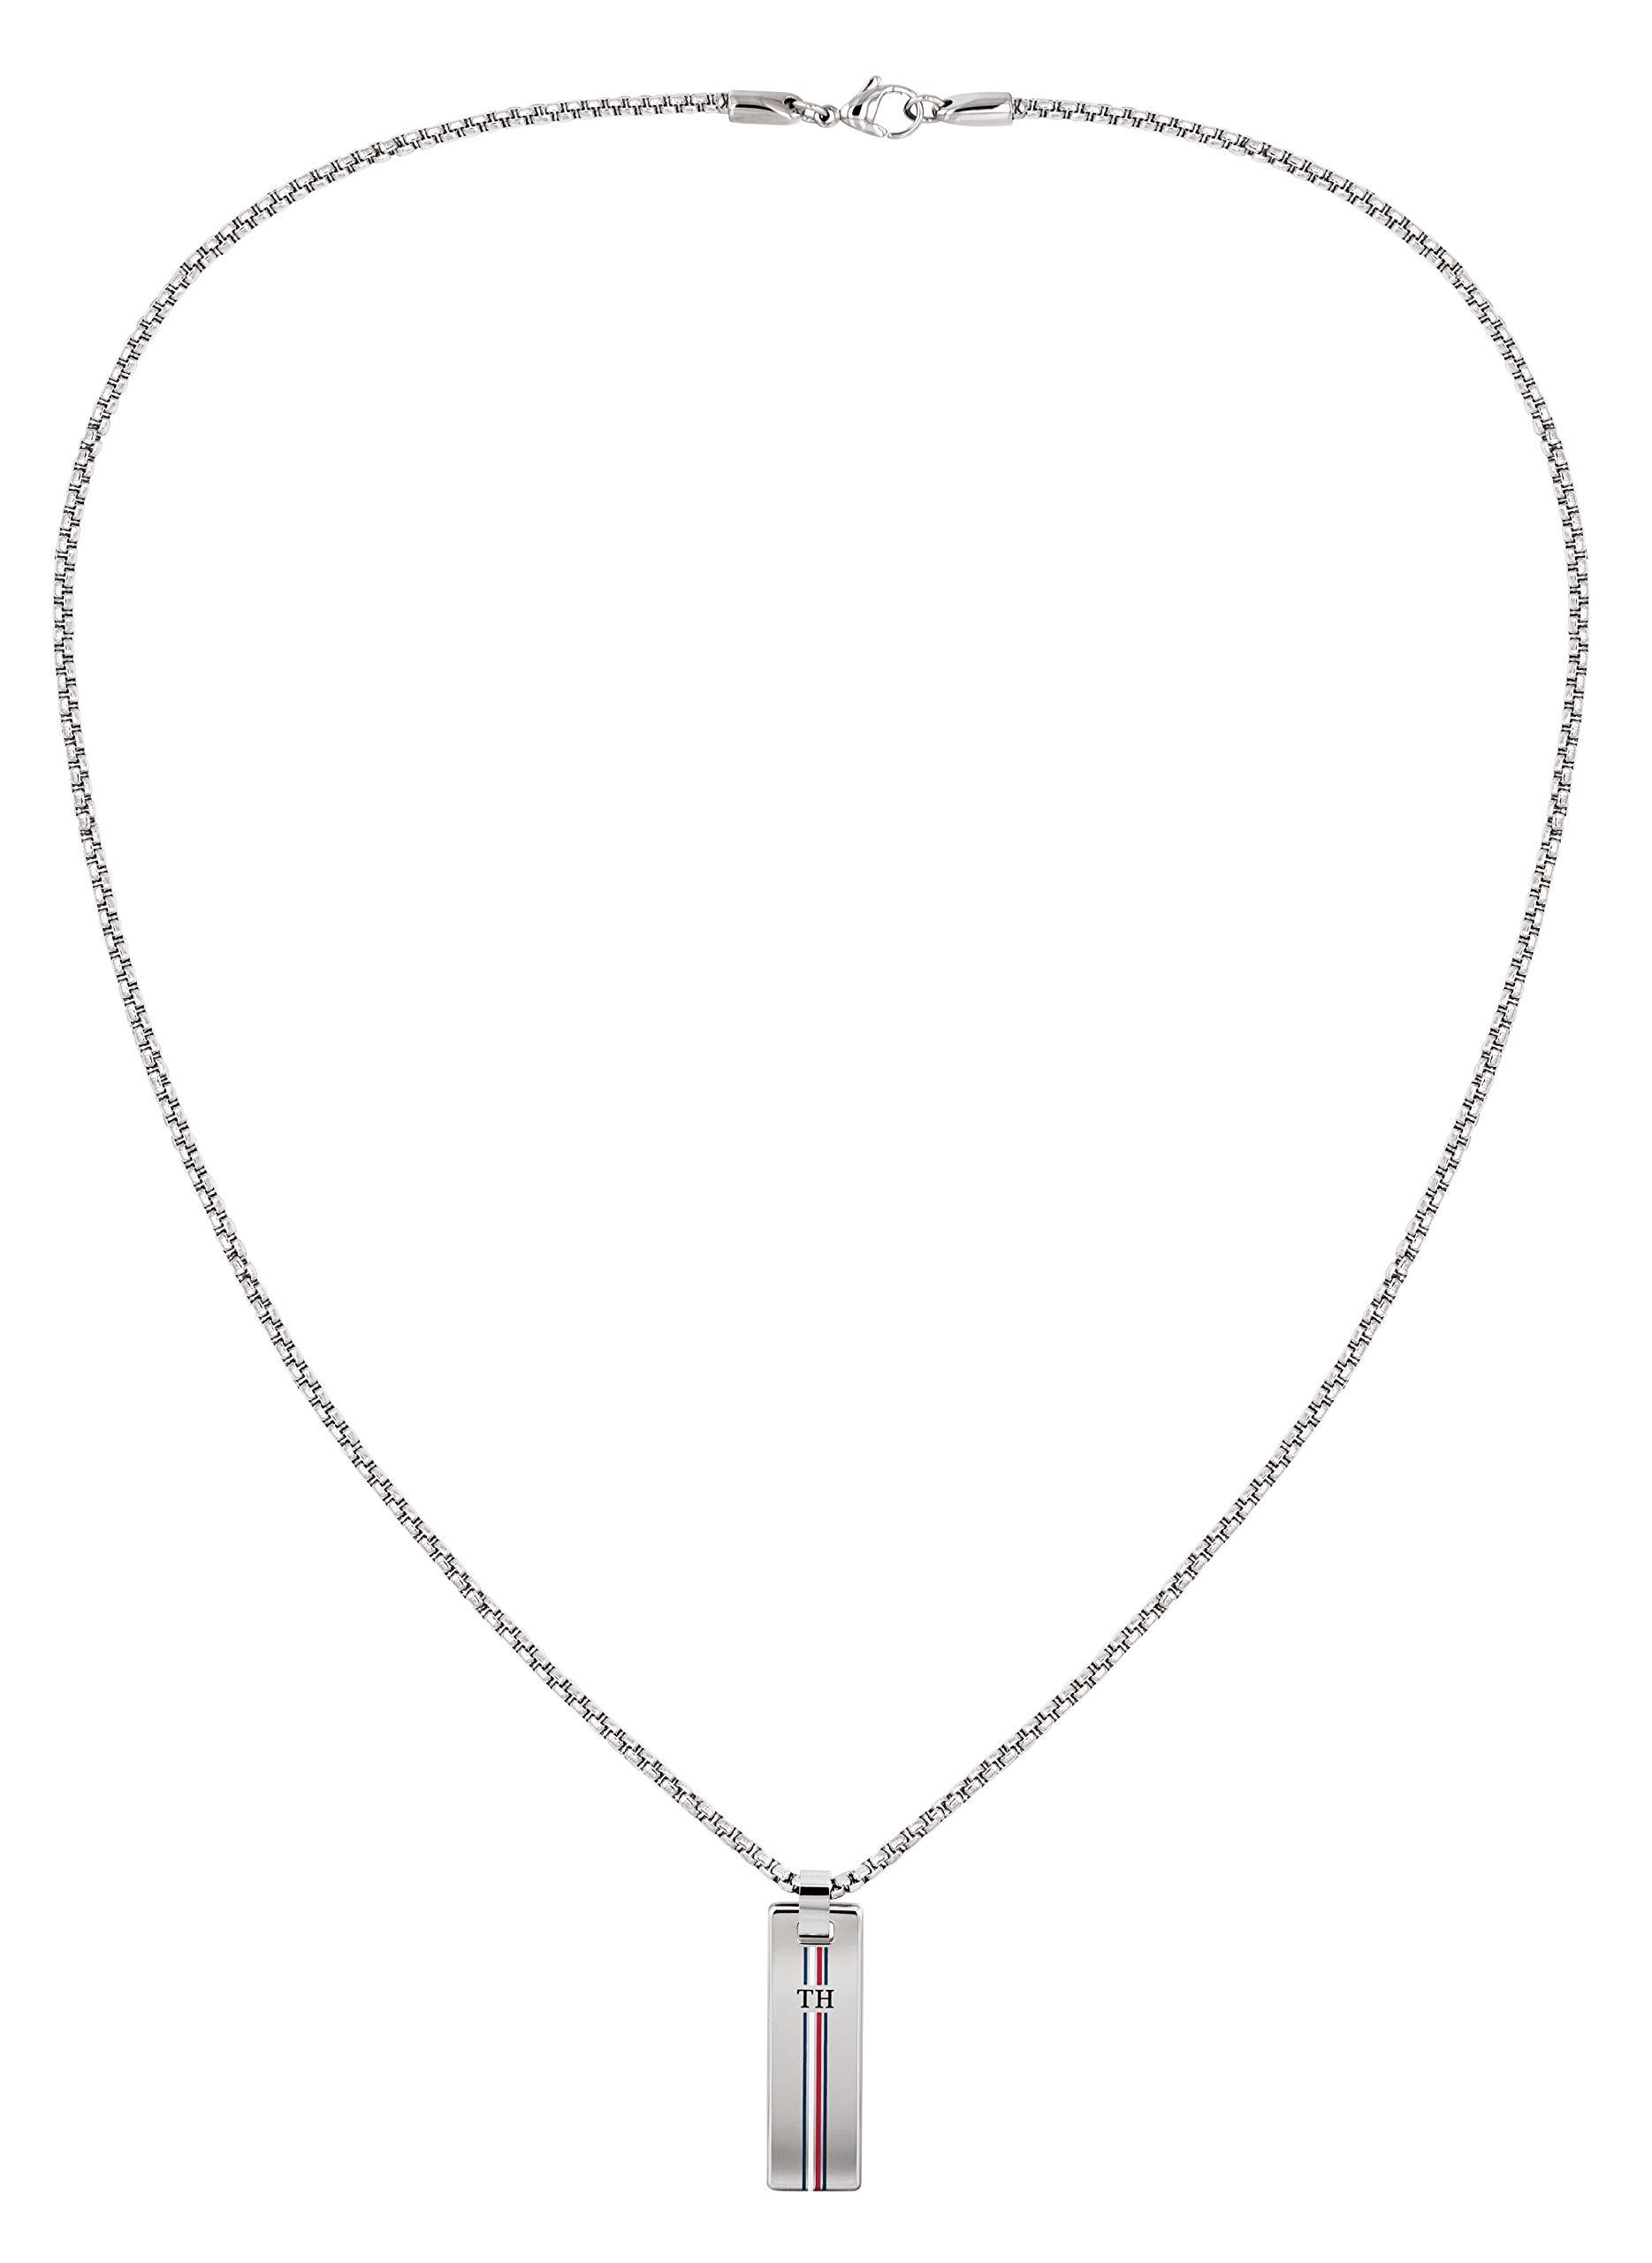 Jewelry Herren Ketten mit Anhänger & Edelstahl - 2790169